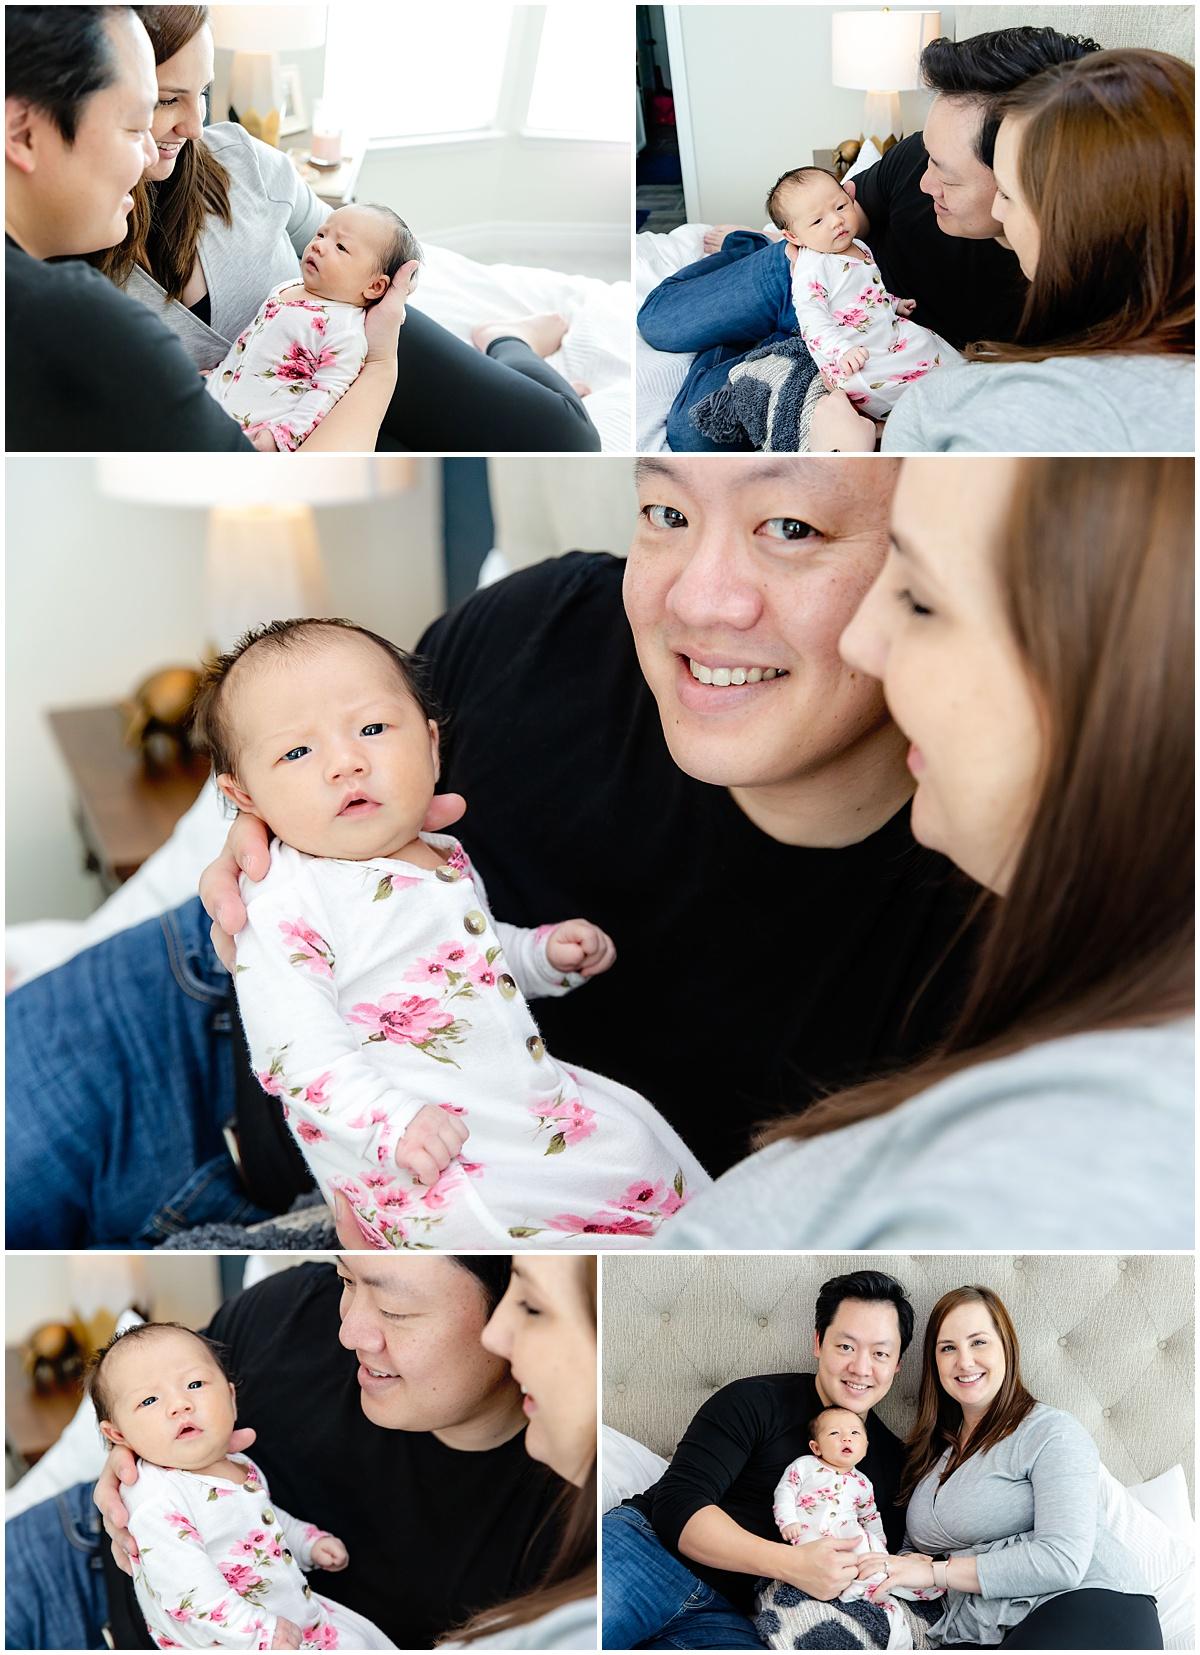 Lifestyle-newborn-family-photos-san-antonio-texas-carly-barton-photography_0003.jpg